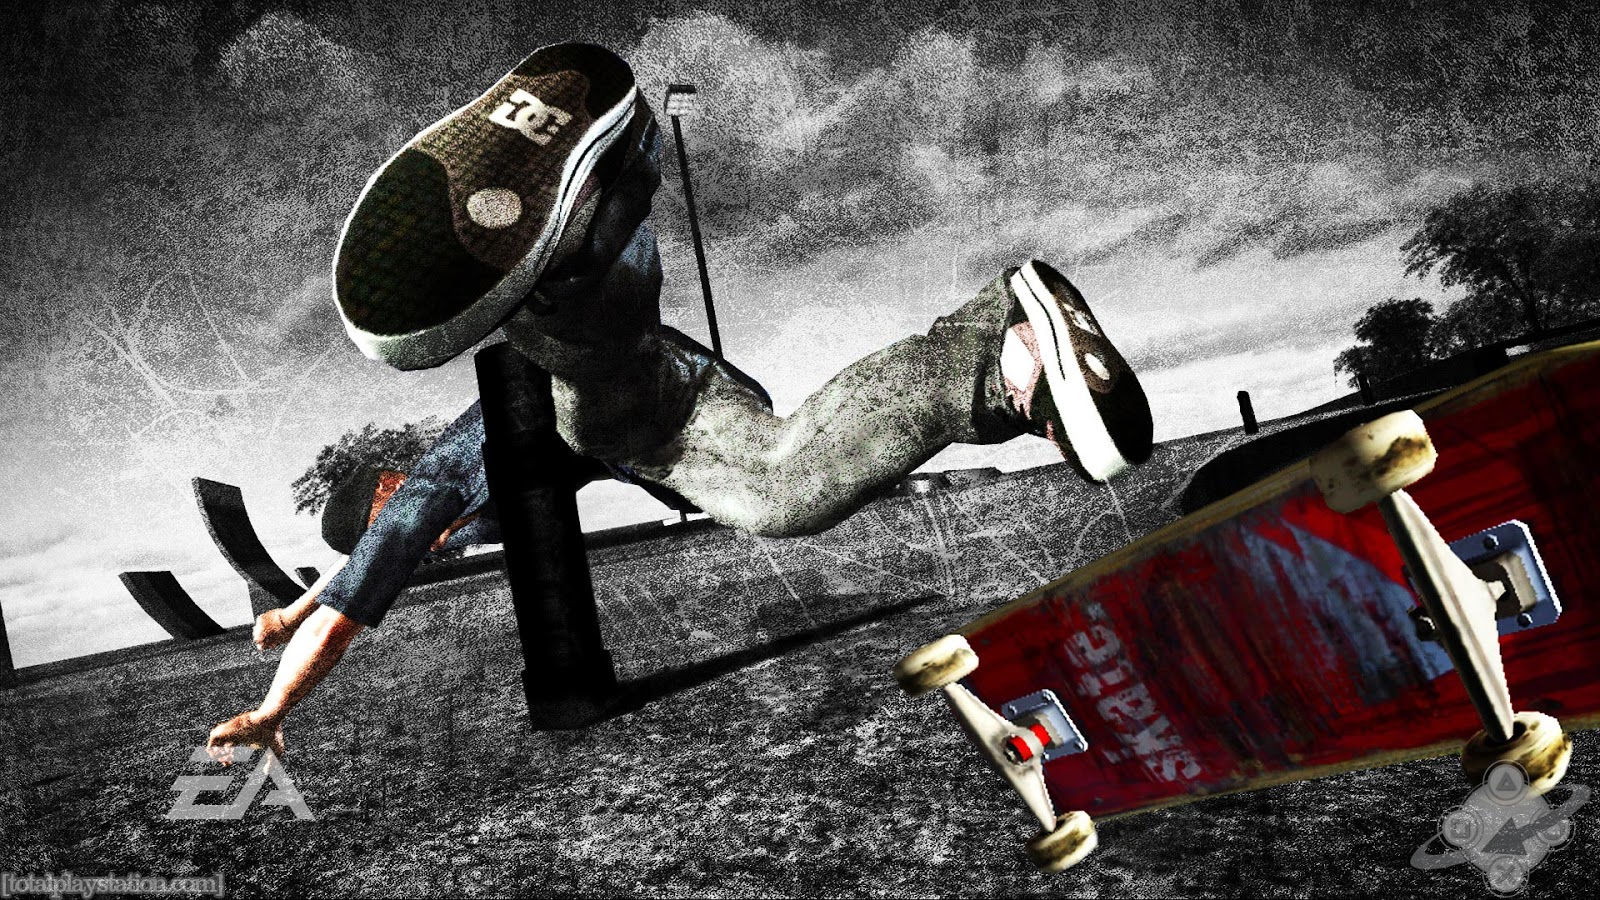 Hd Wallpapers Skateboard Logos 1024 X 768 30 Kb Jpeg HD Wallpapers 1600x900